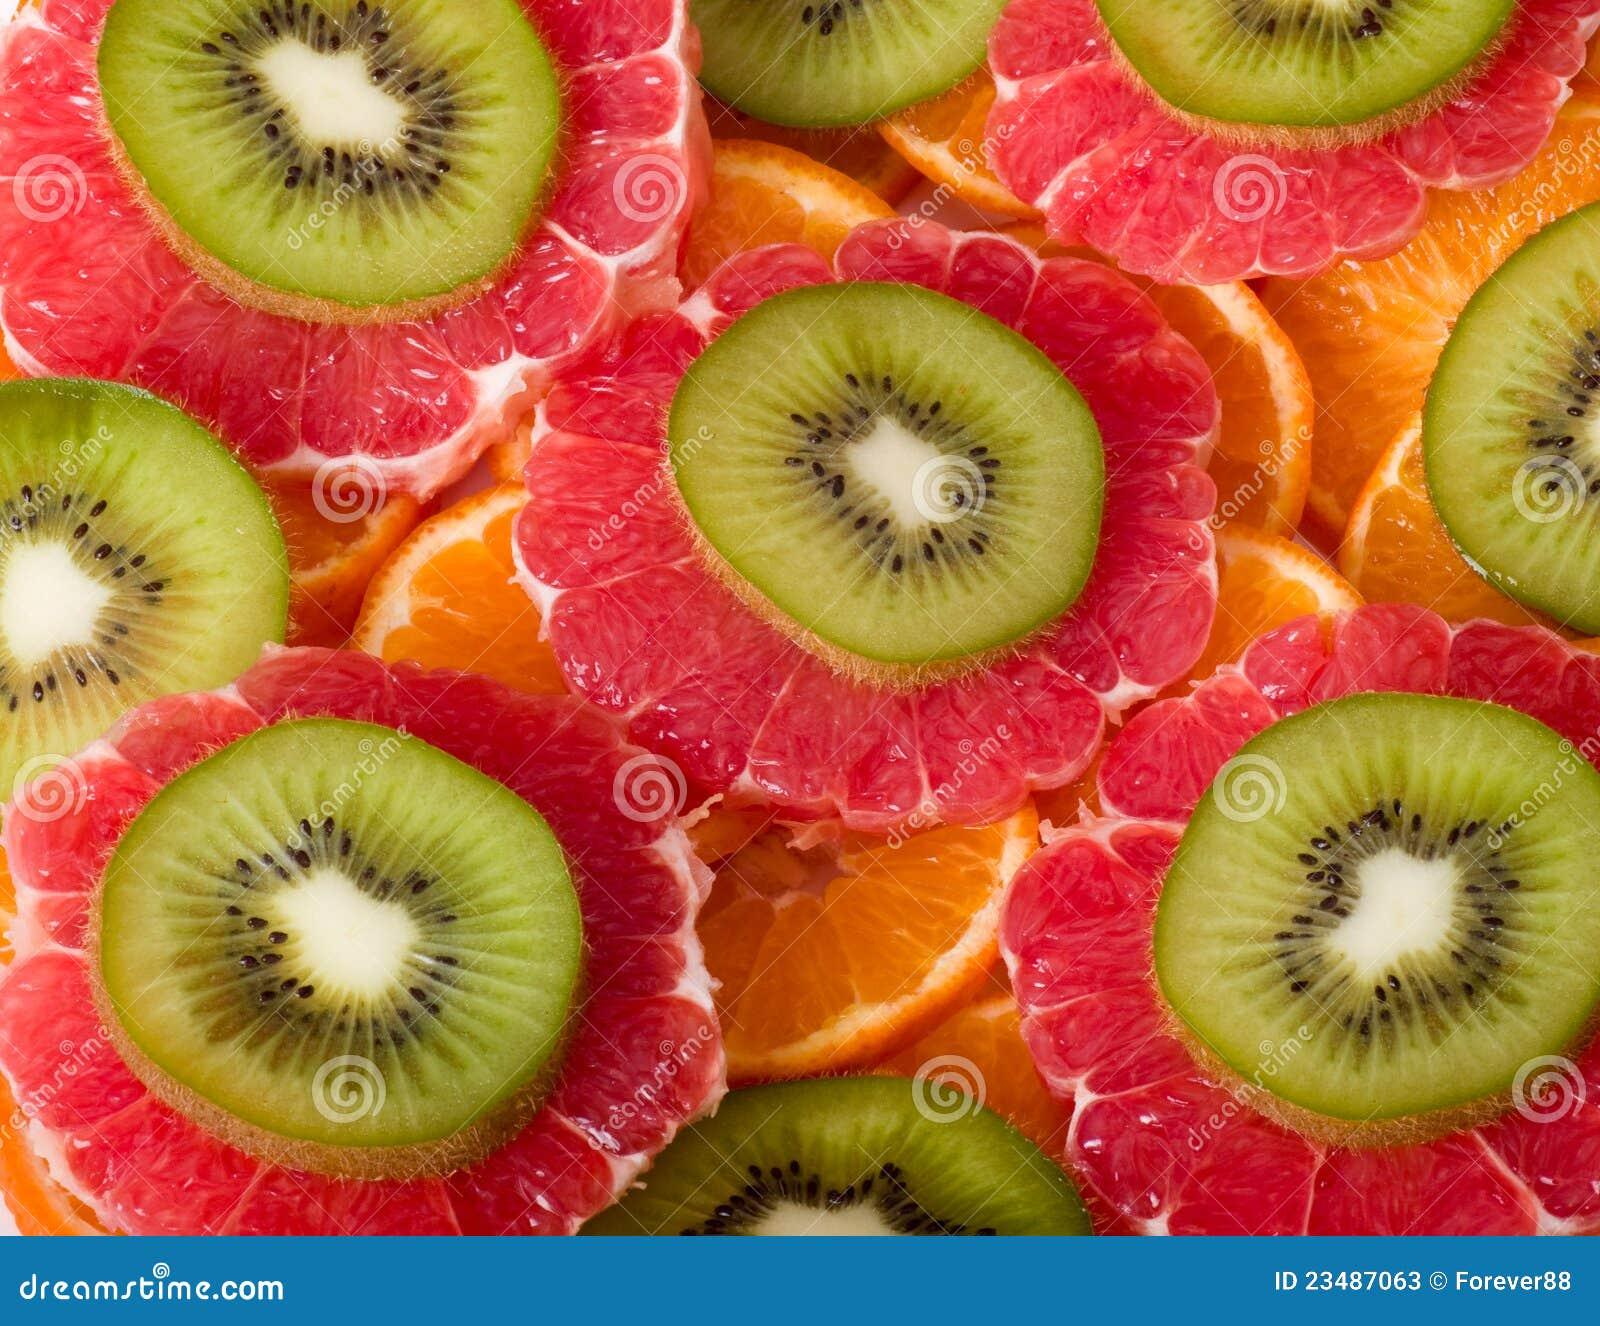 Kiwi, pomelo y naranja